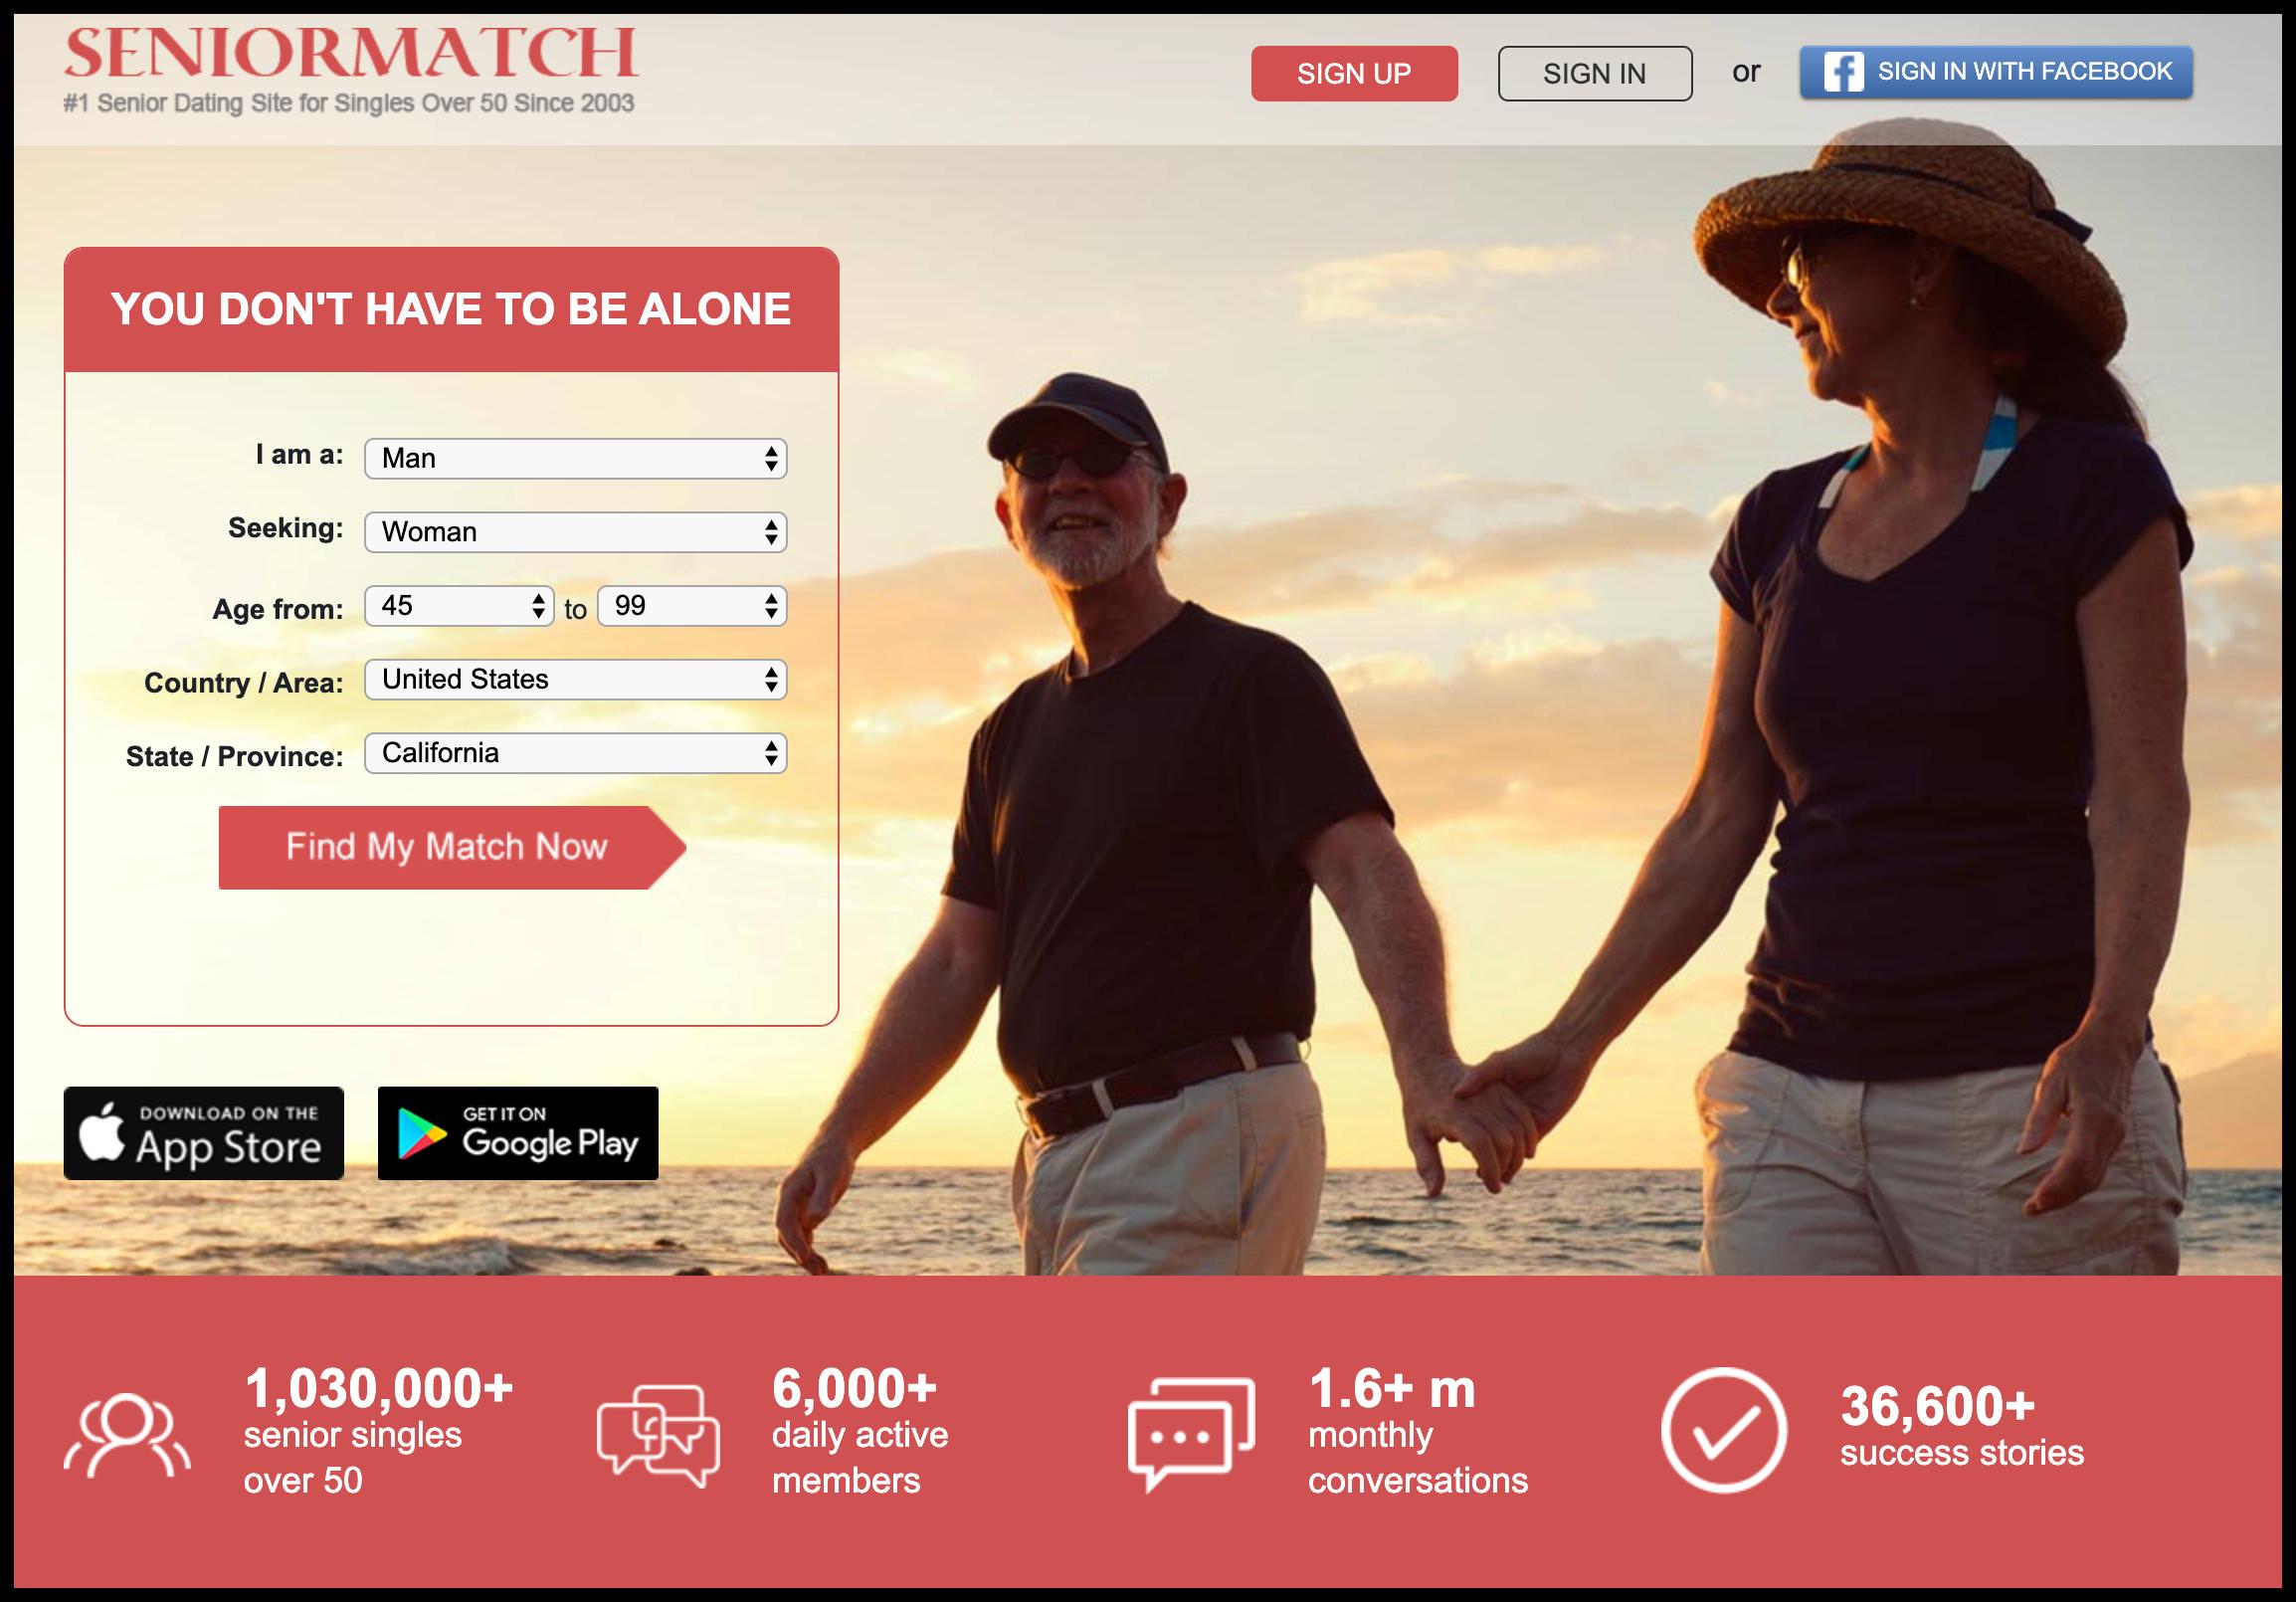 seniormatch senior dating website